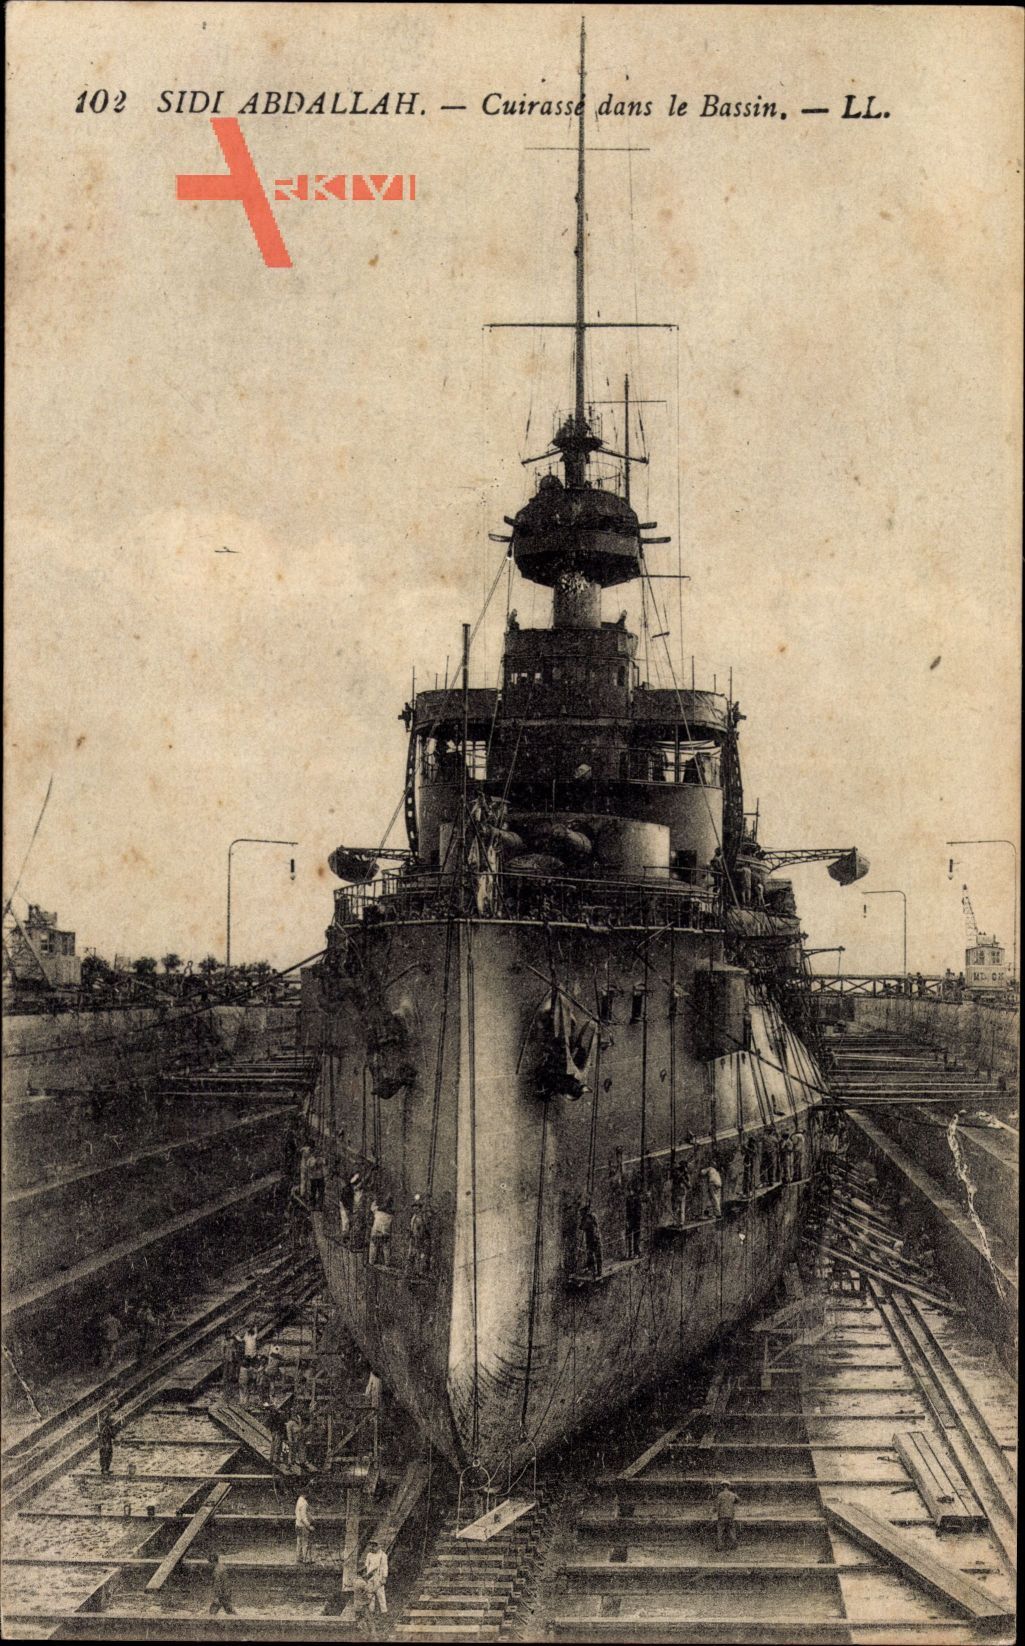 Sidi Abdallah Tunesien, Cuirassé dans le Bassin, Trockendock, Kriegsschiff